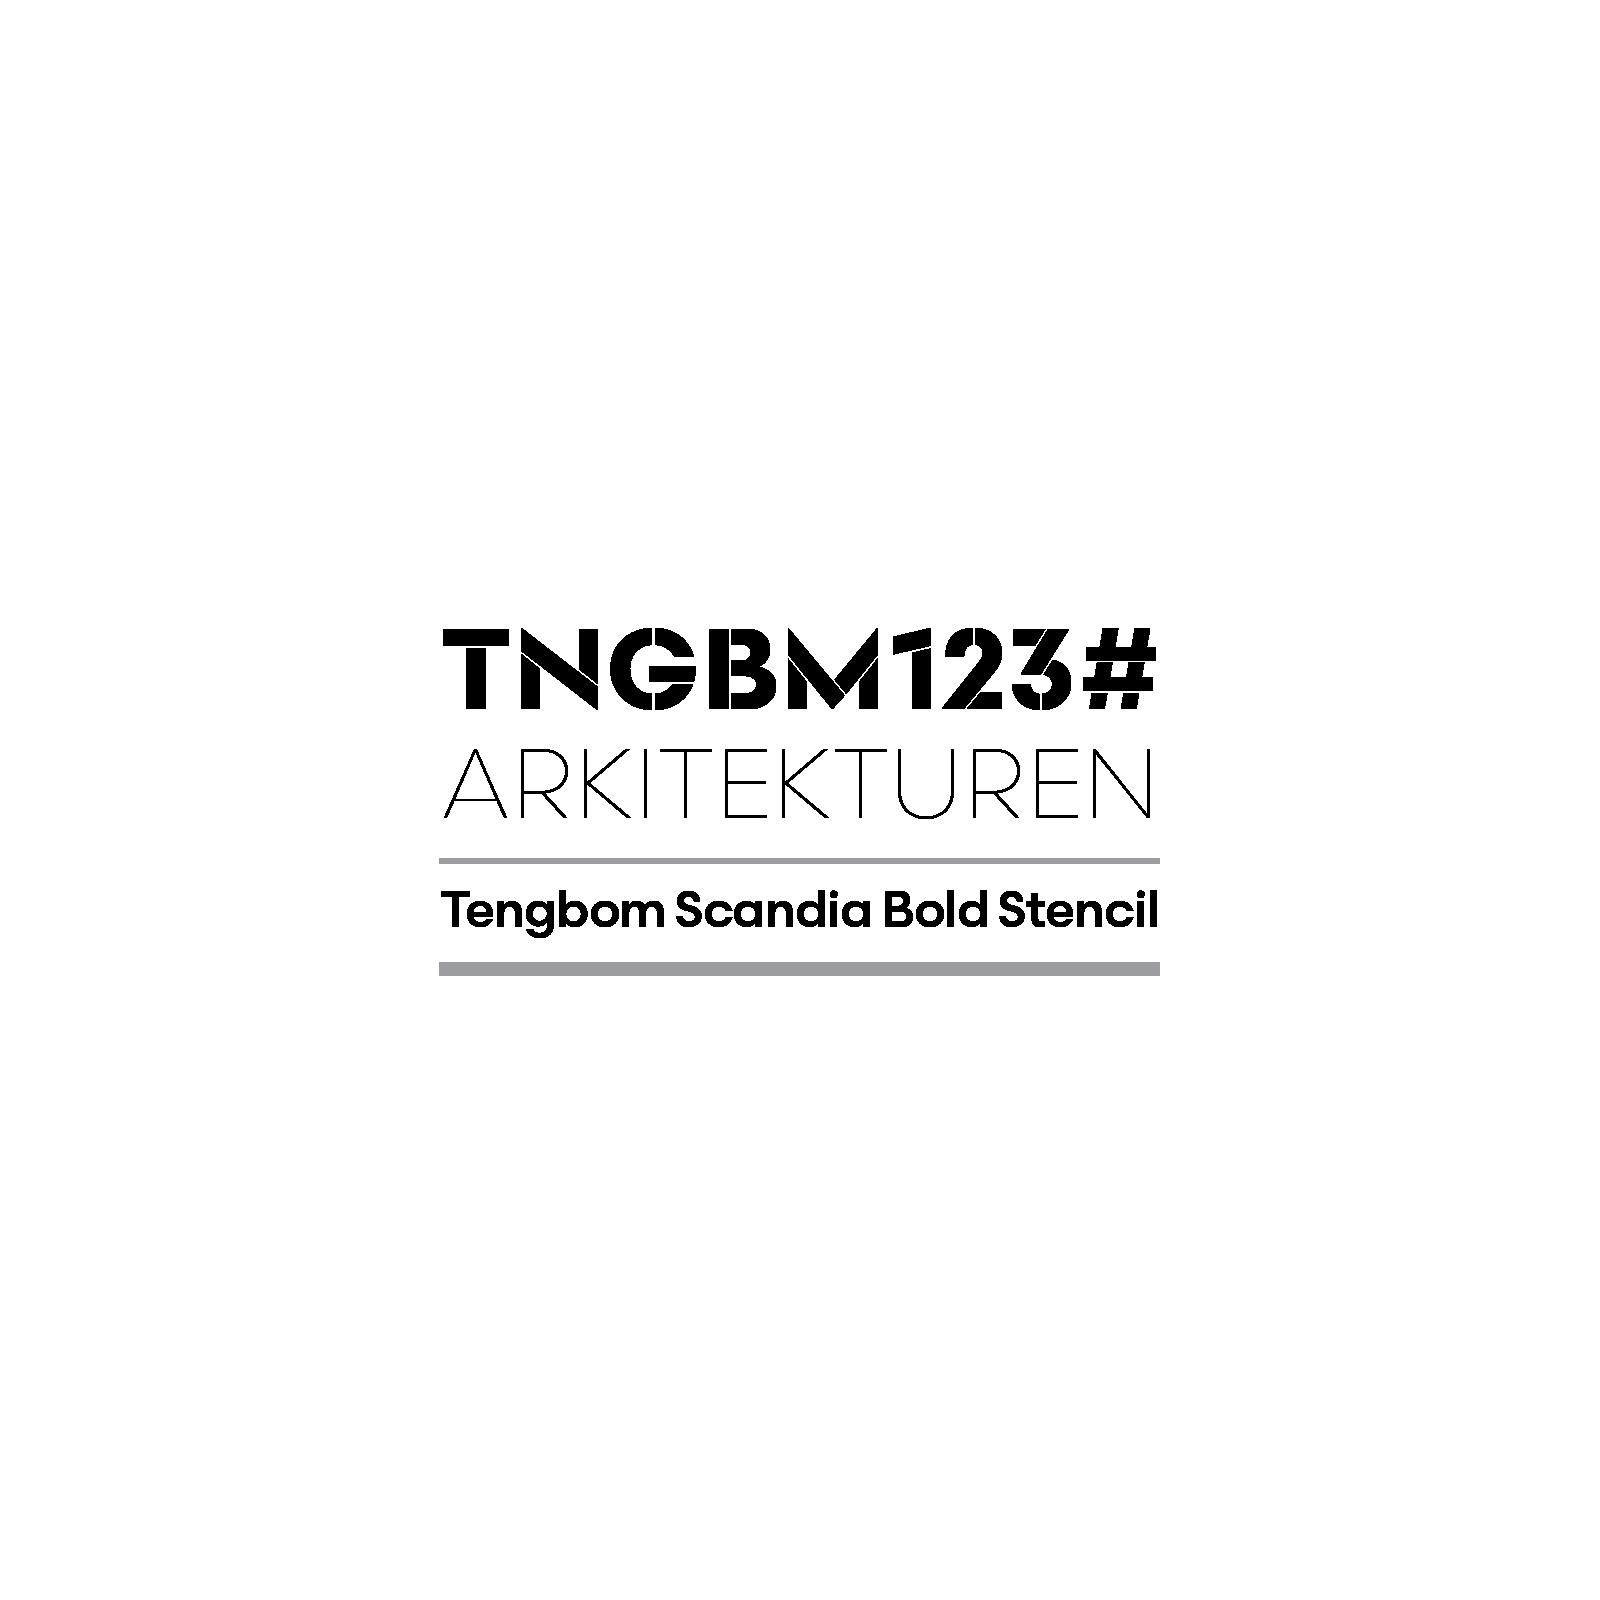 tengbom_handbook_type12-copy-e1470391208474.png